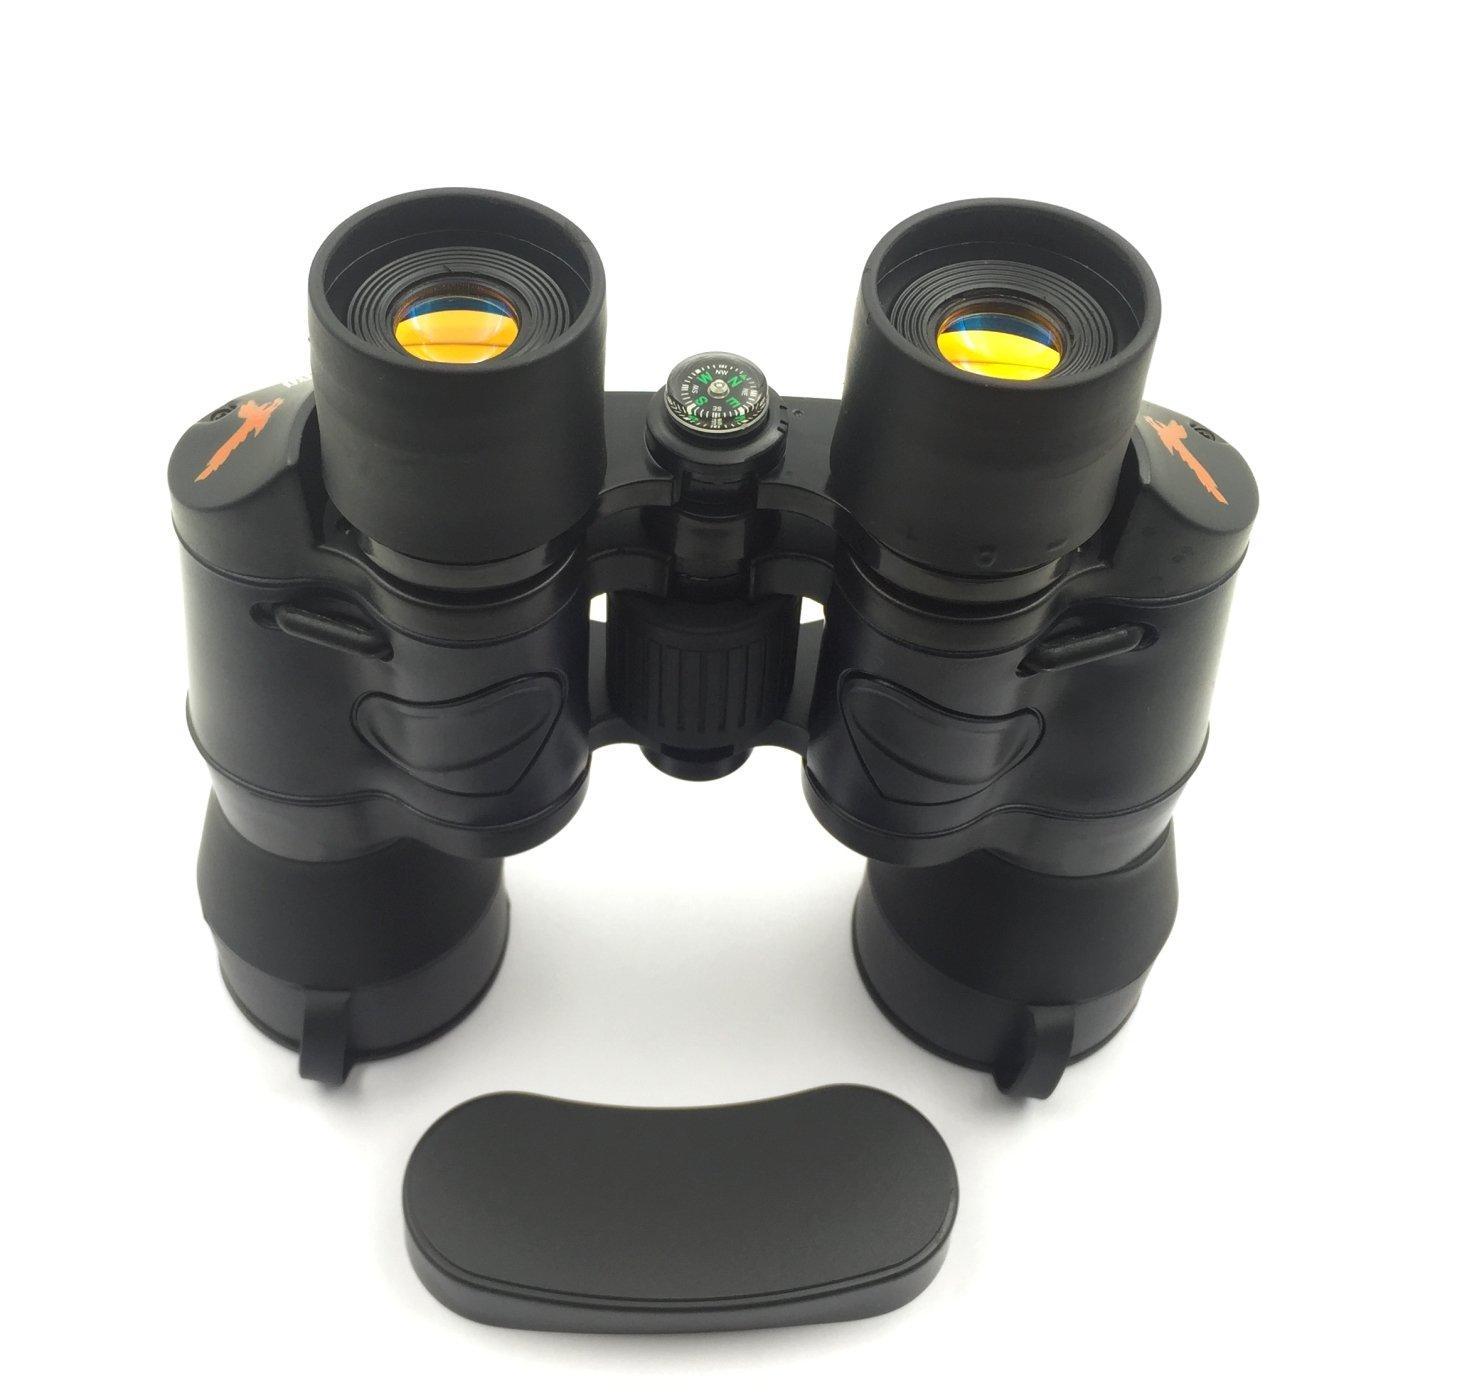 Mystery高電源ズーム双眼鏡、50 x 50ズーム双眼鏡の屋外旅行、W / Carryケース&ストラップ B01A5J34E4